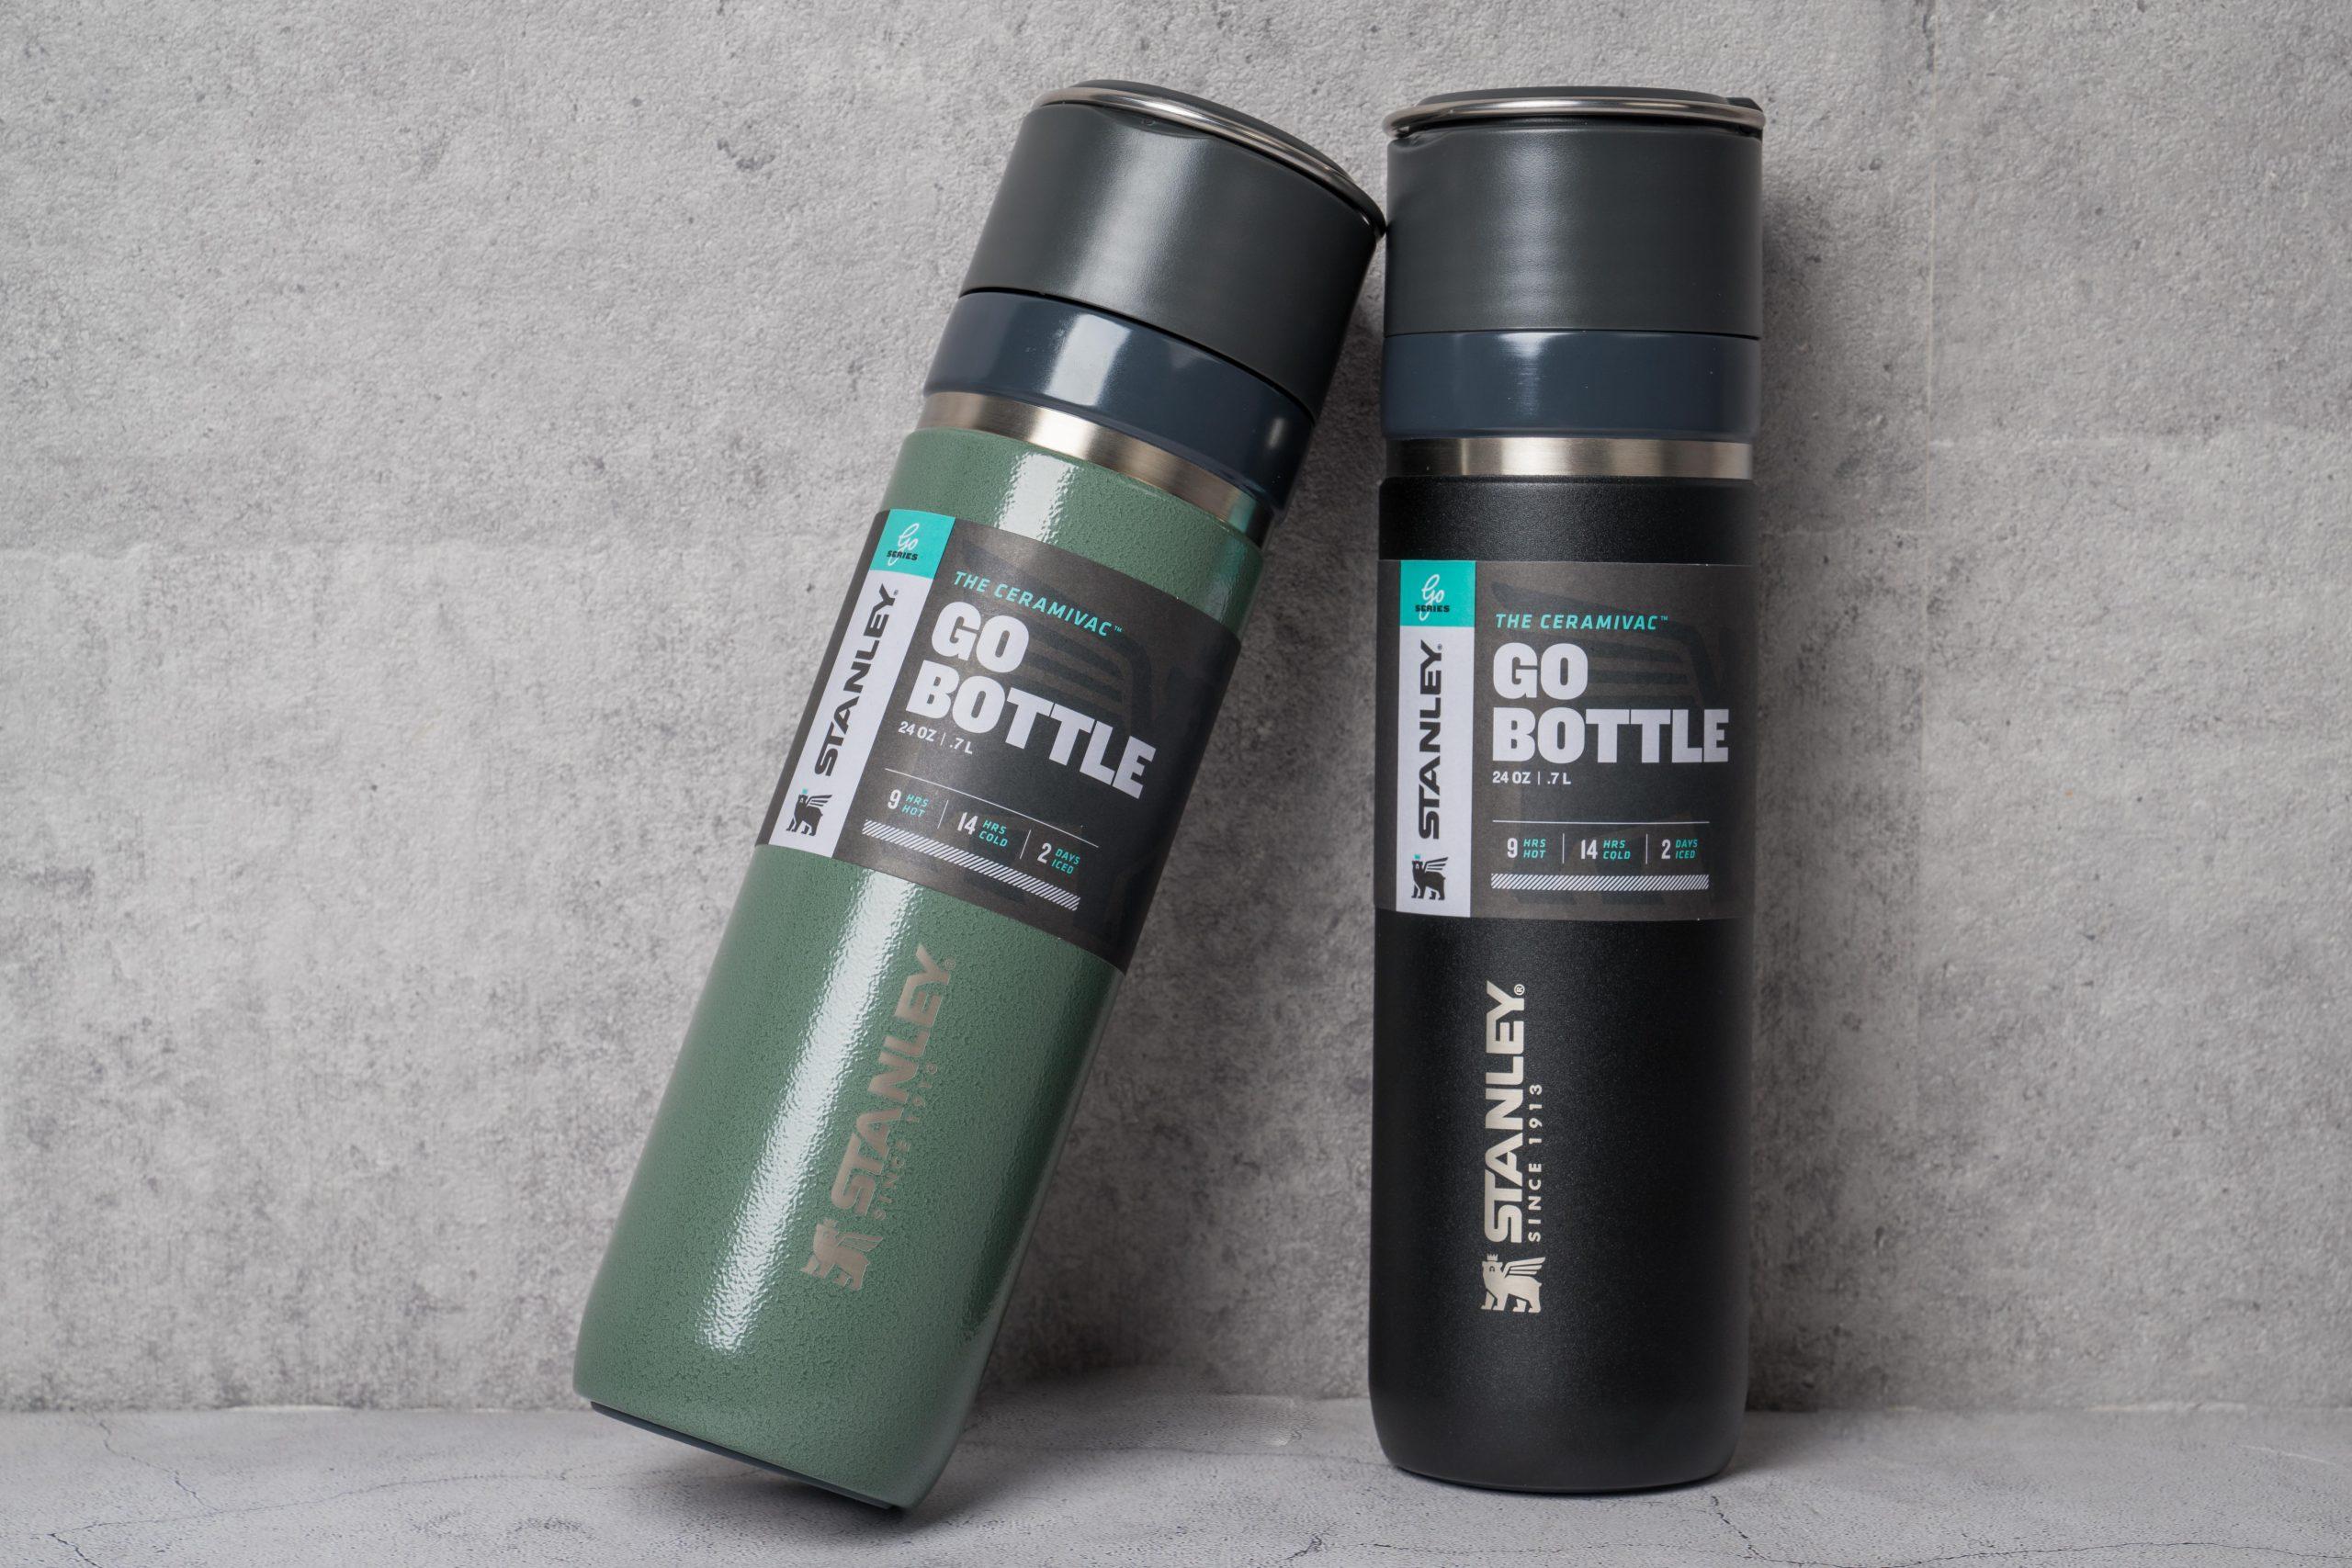 Stanley Ceramivac GO Bottle 14oz